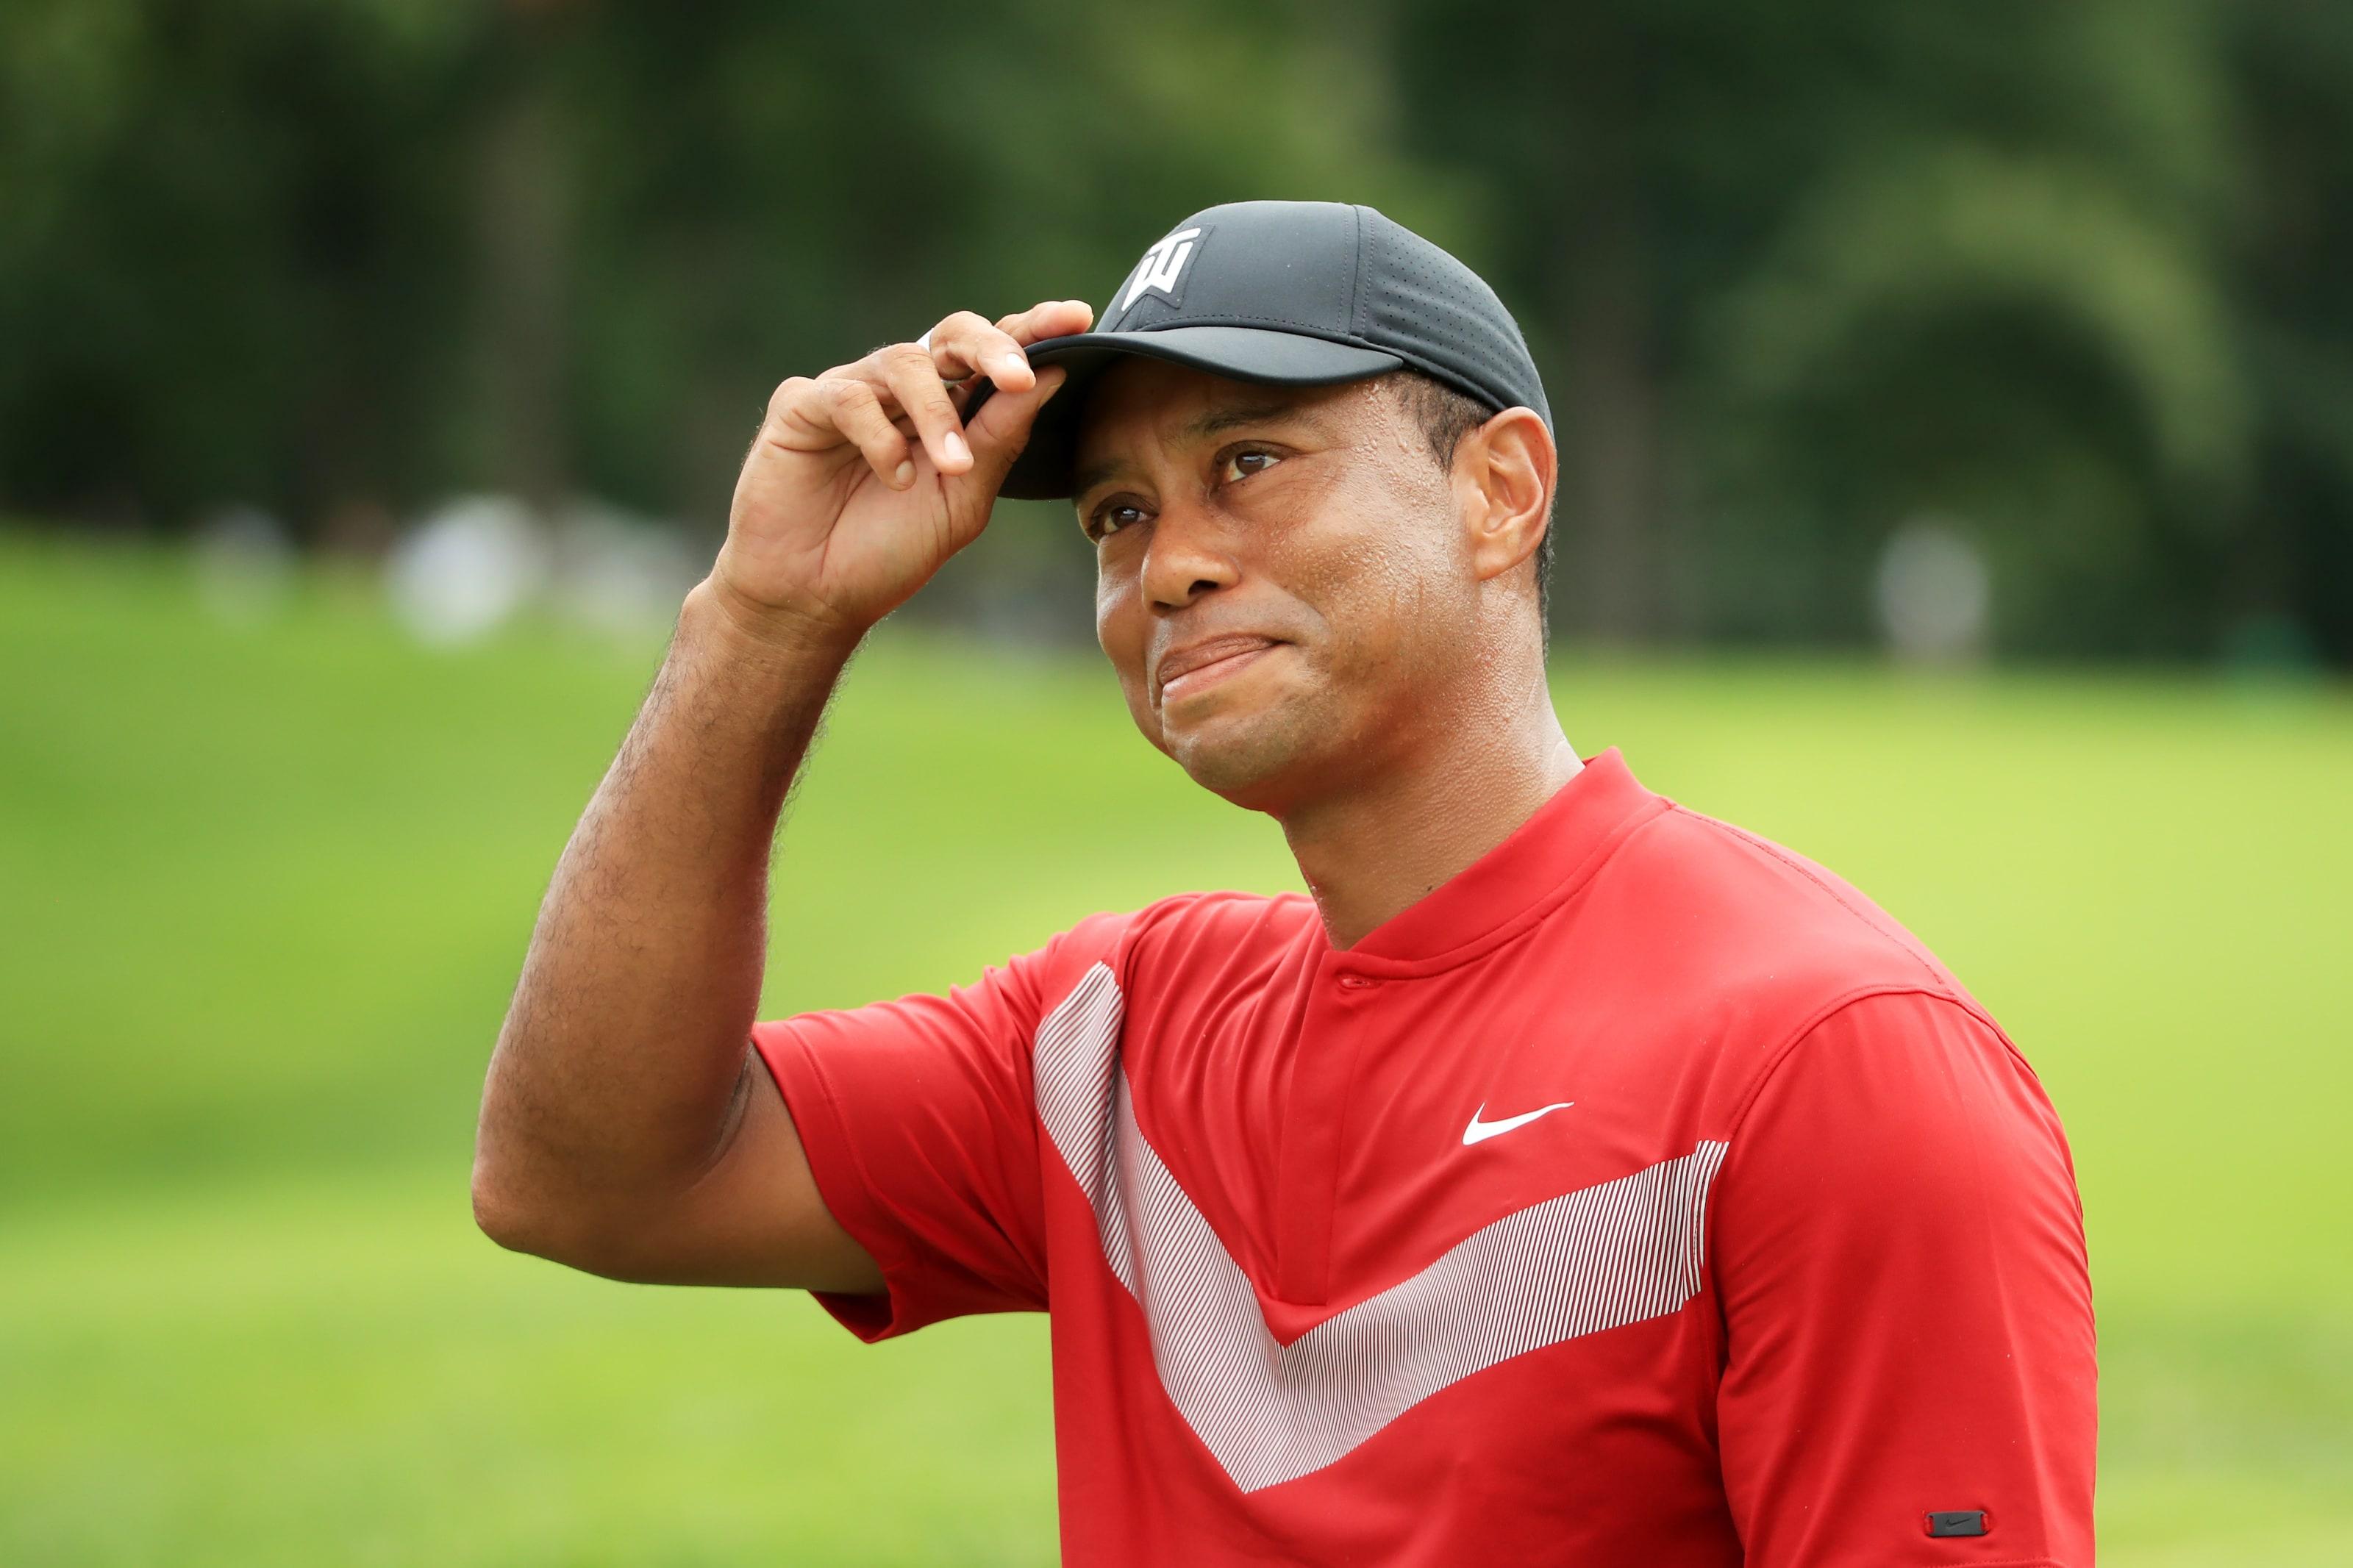 Tiger Woods: Tiger's Top 10 Greatest Career Shots